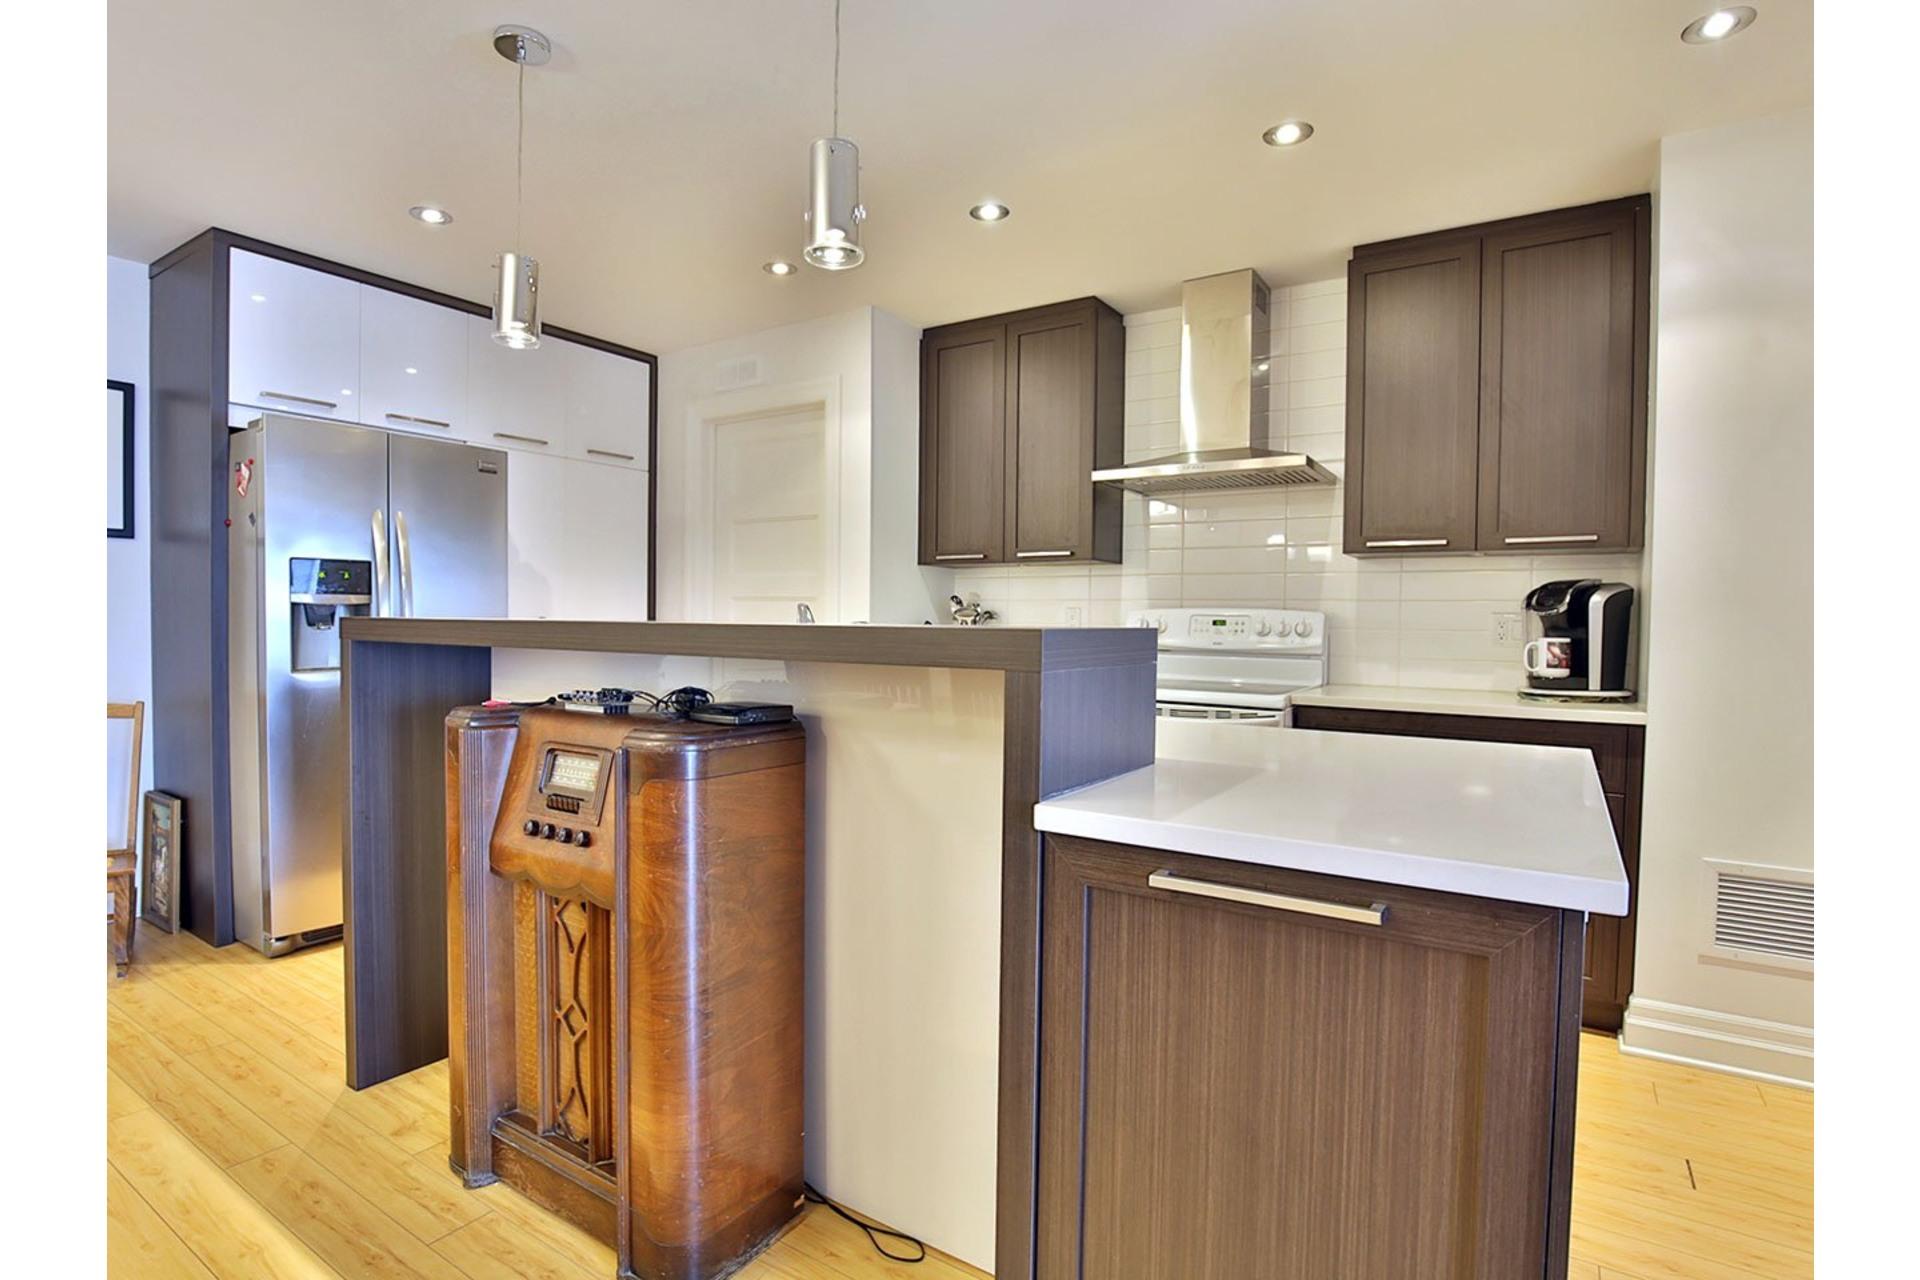 image 3 - Apartment For sale Varennes - 5 rooms